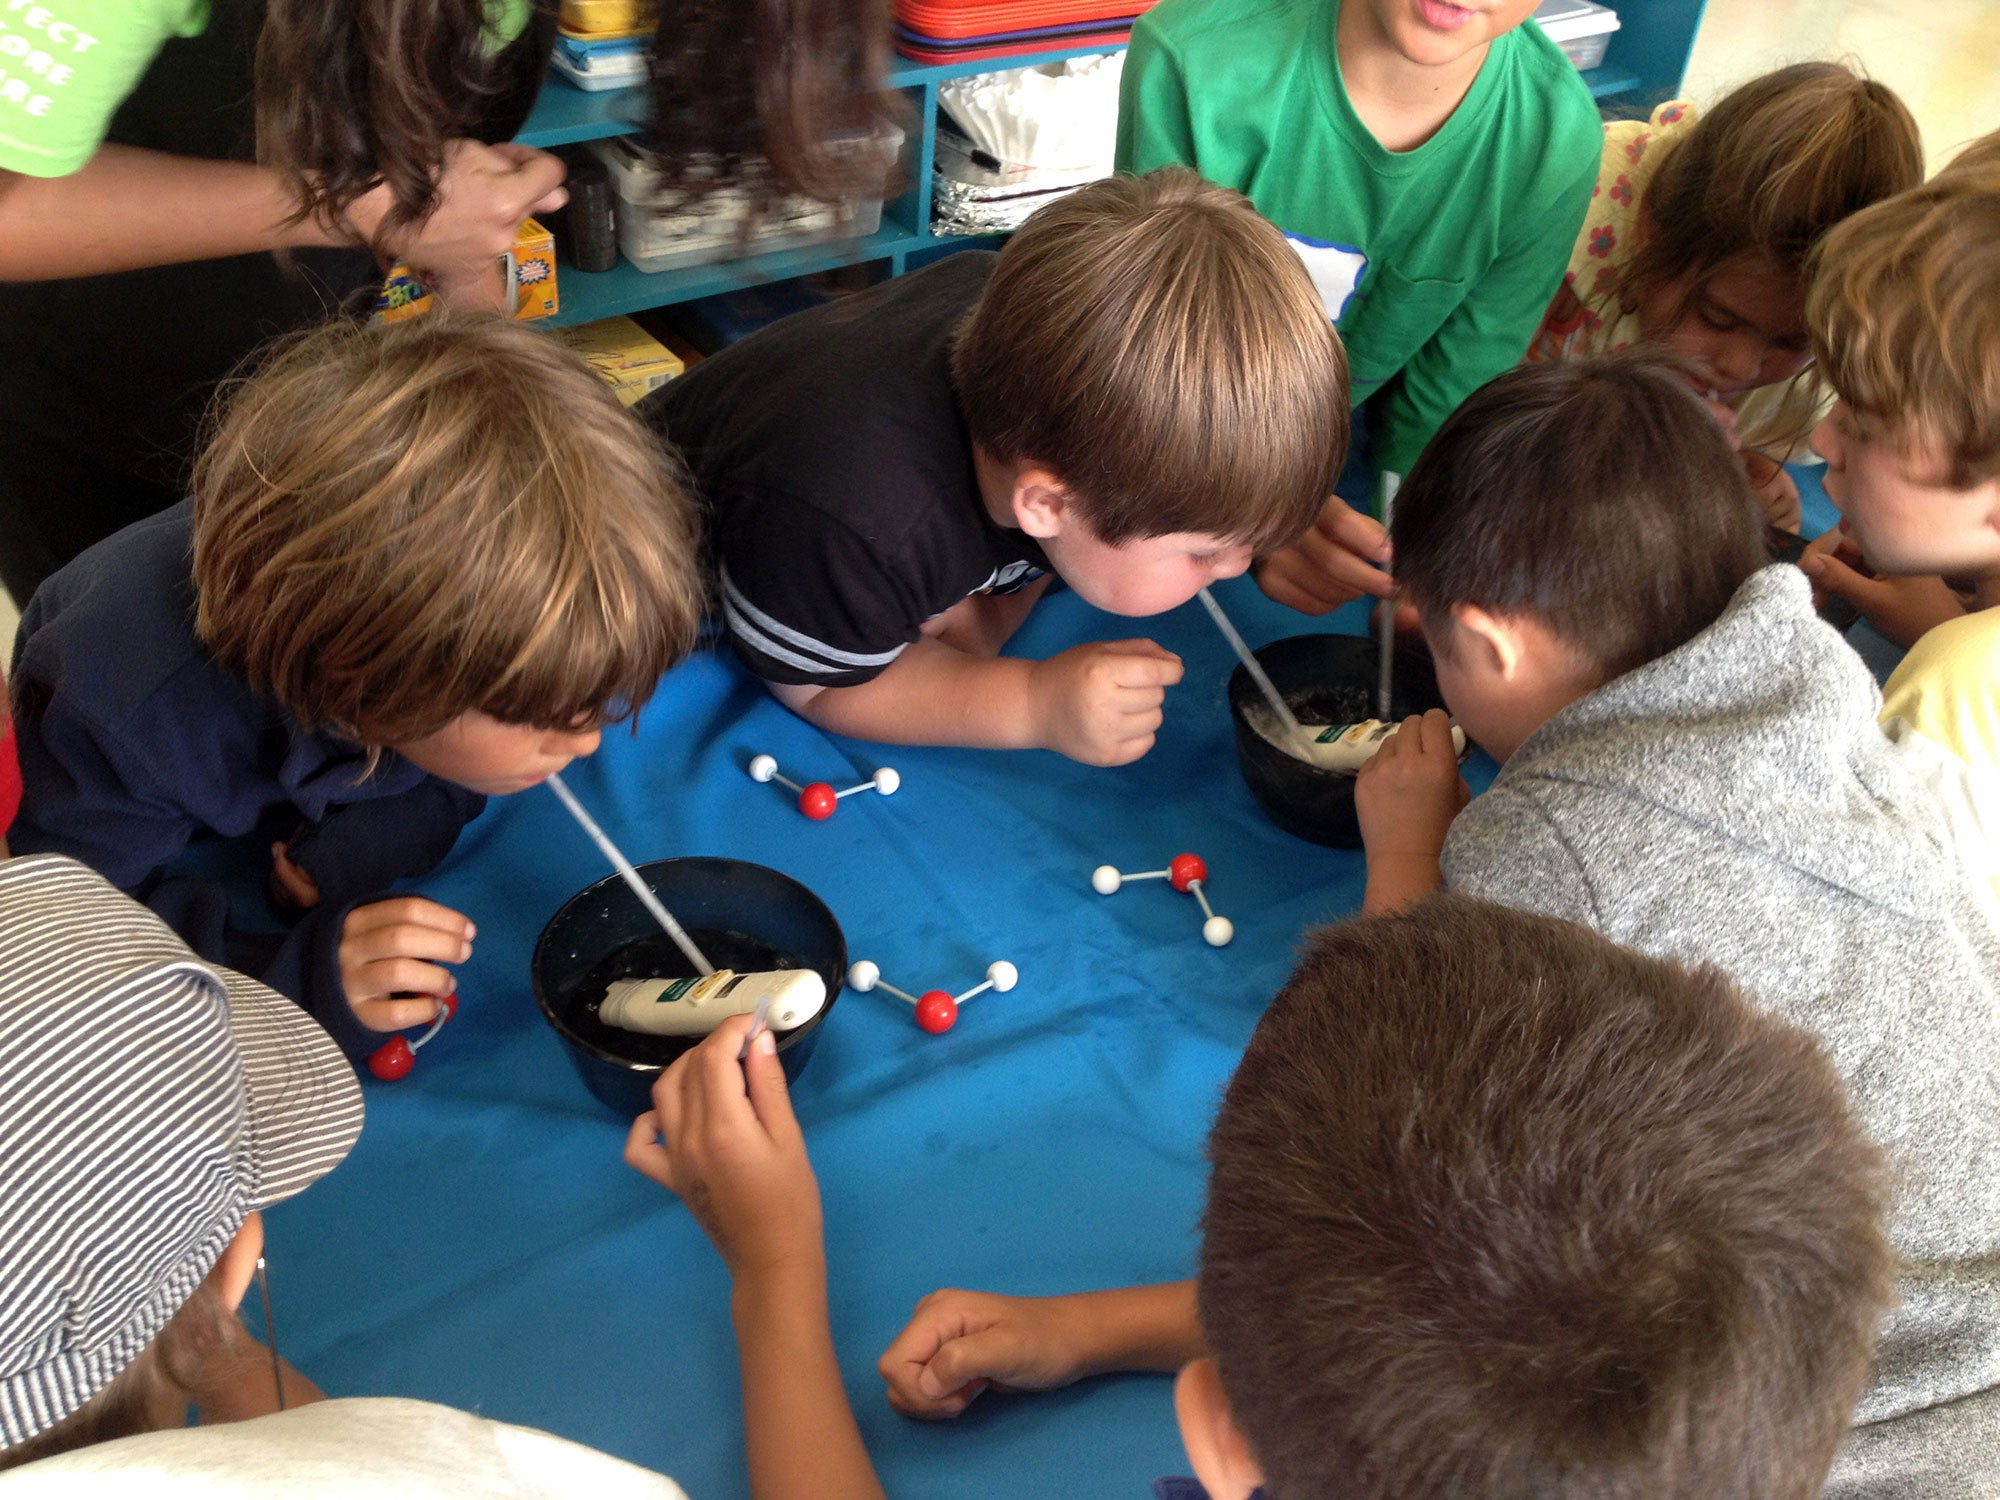 Kids at climate change education program